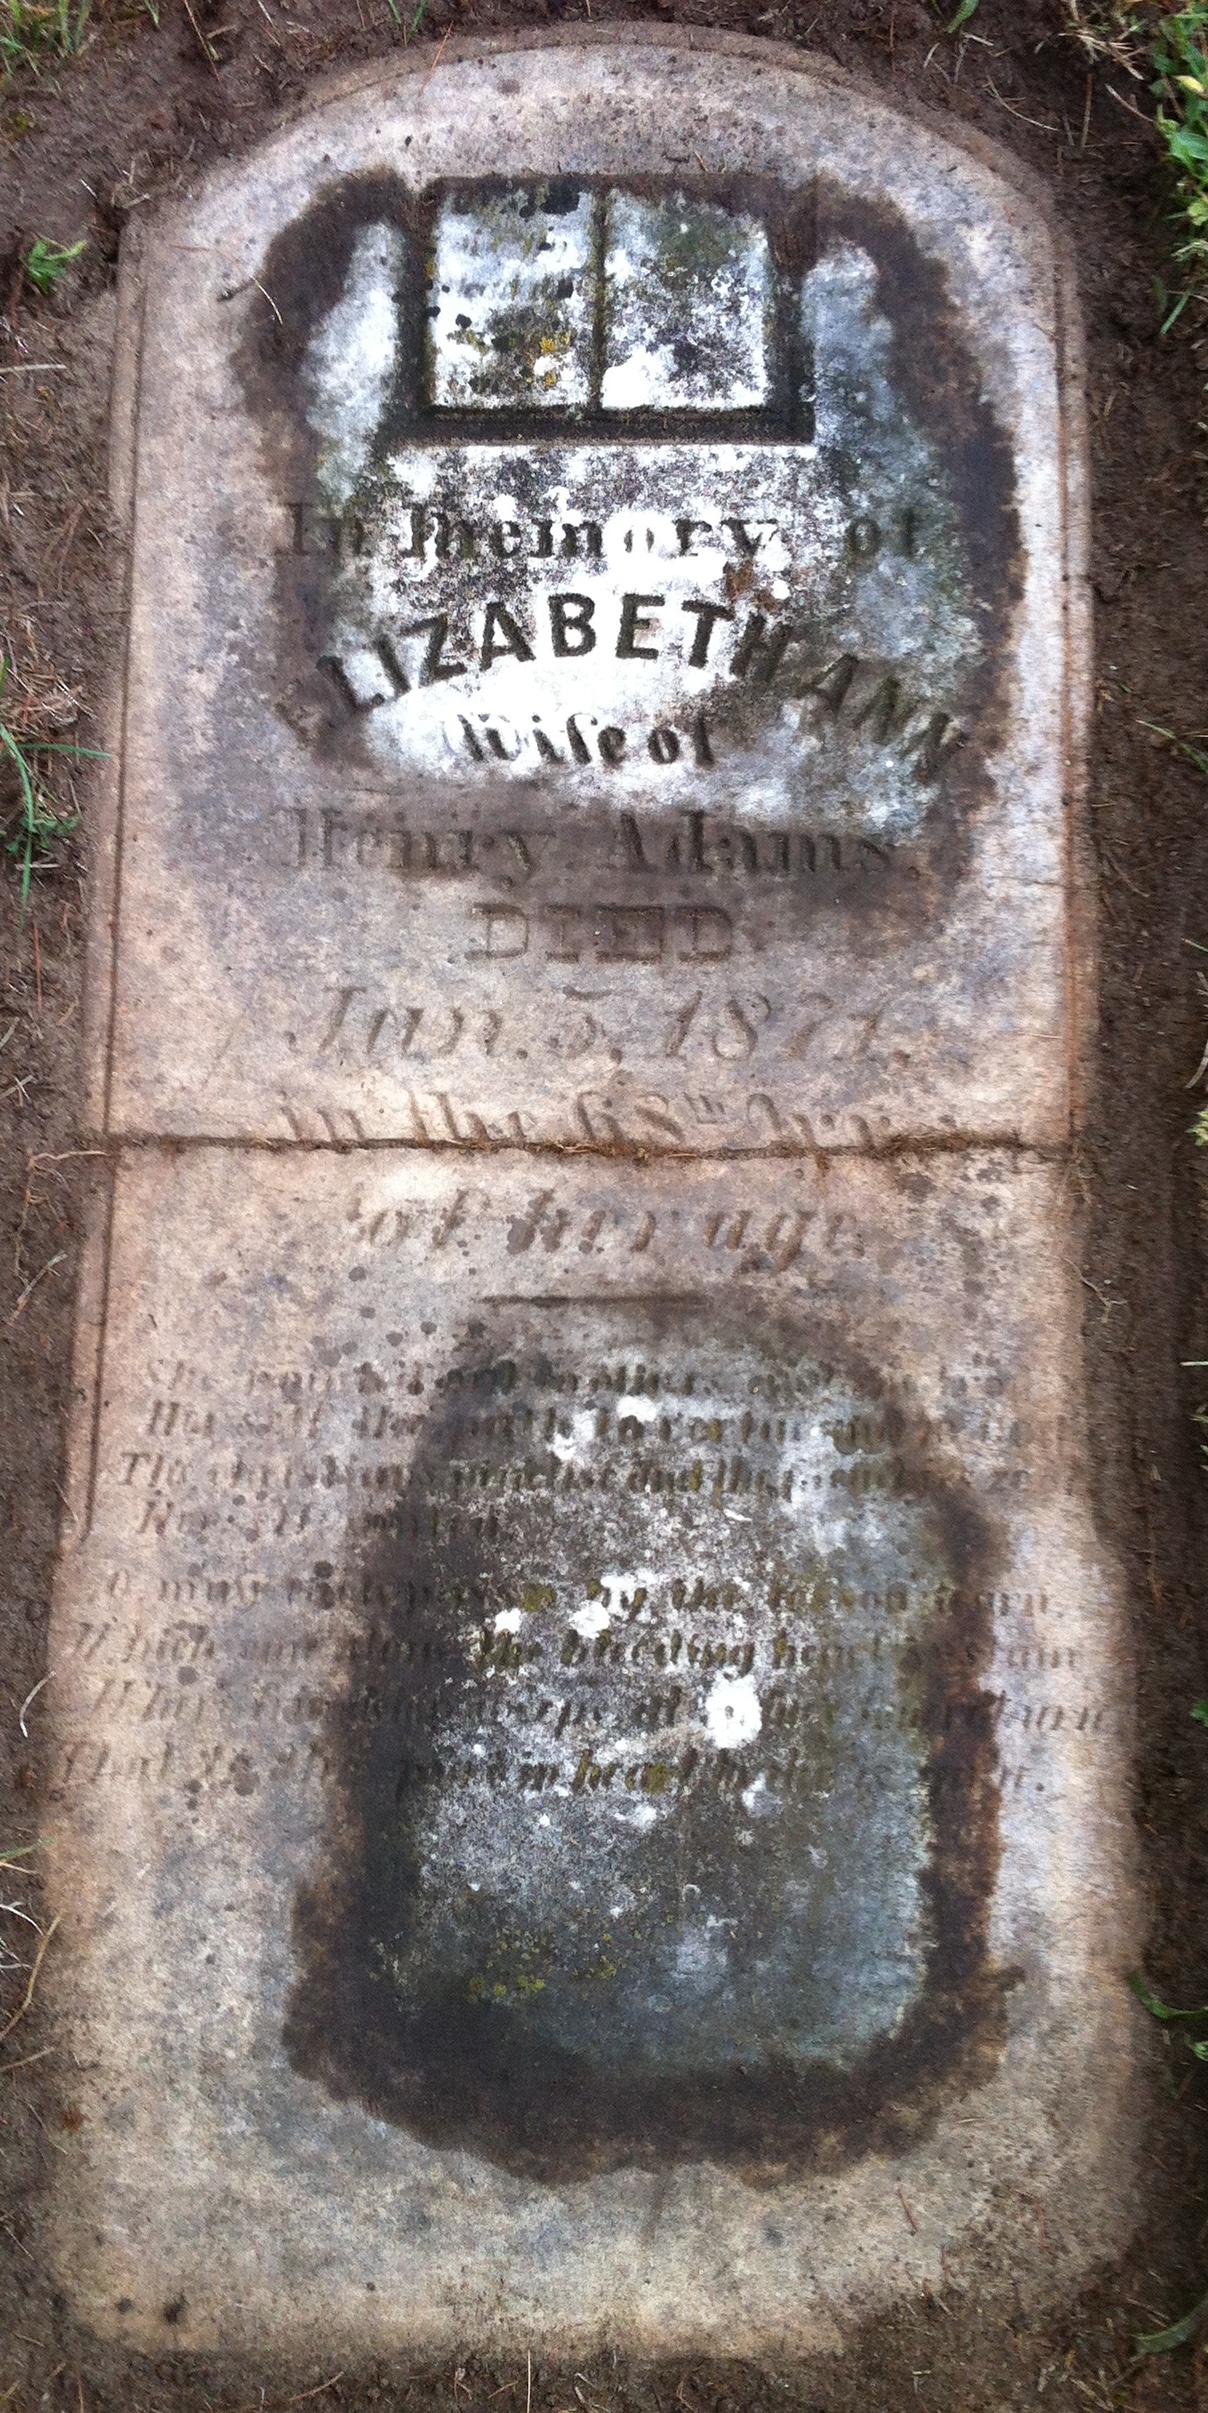 Tombstone at Strathroy Cemetery - Elizabeth Ann Sinclair Adams (1803-1871)